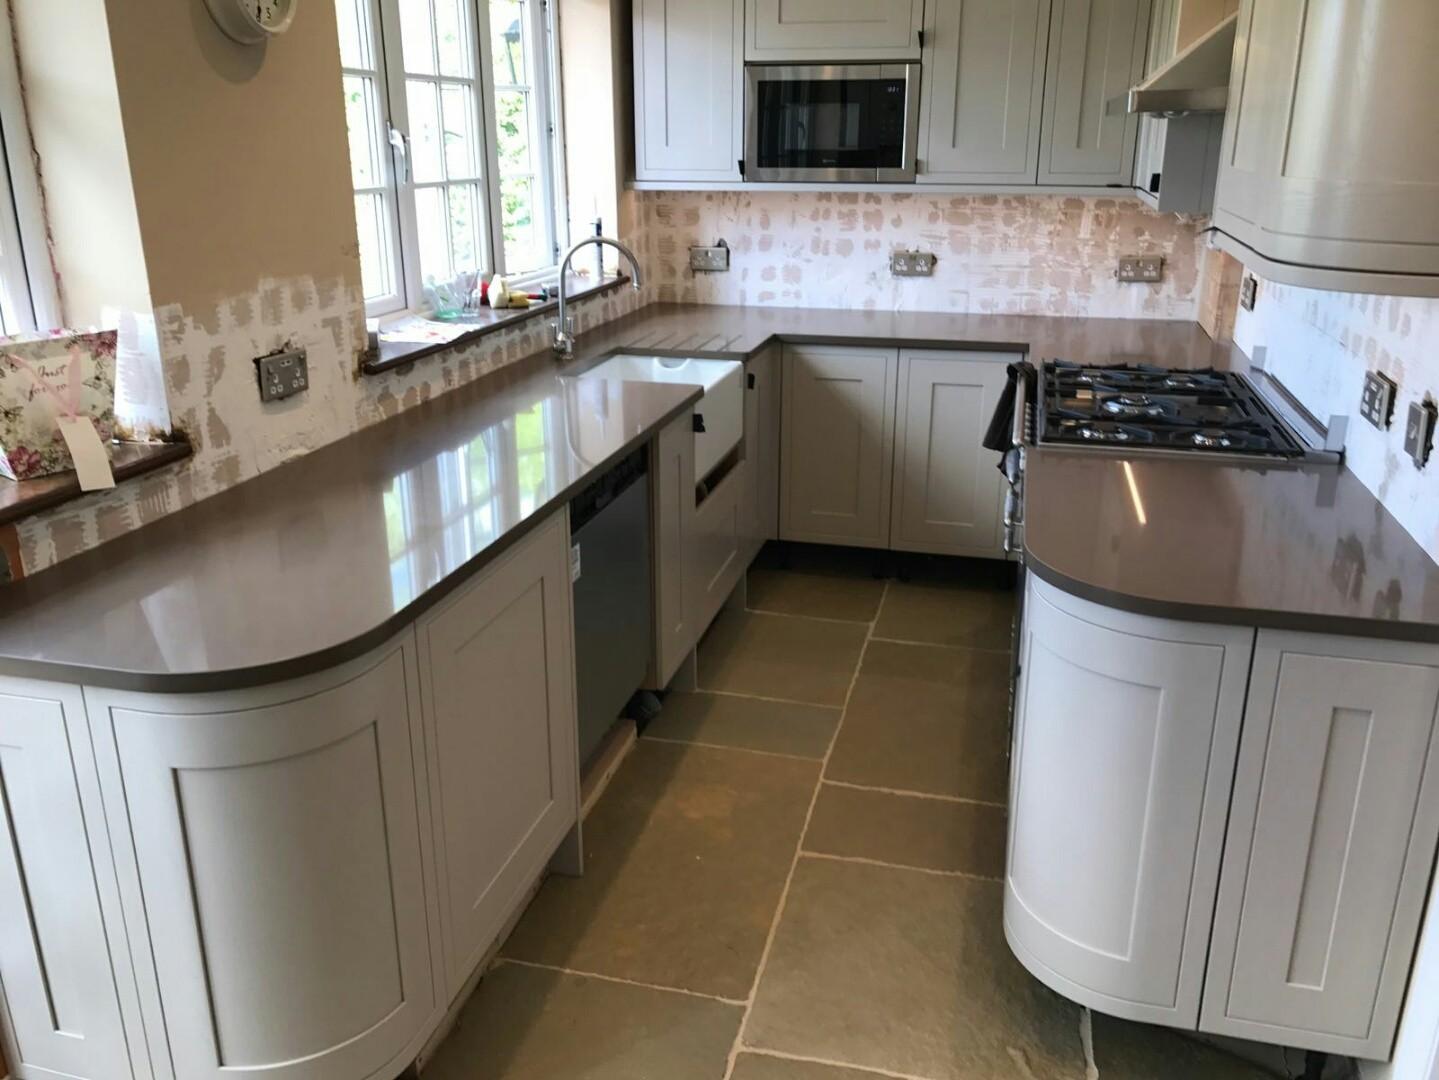 B And Q Kitchen Flooring Mocha Nazeing Essex Rock And Co Granite Ltd